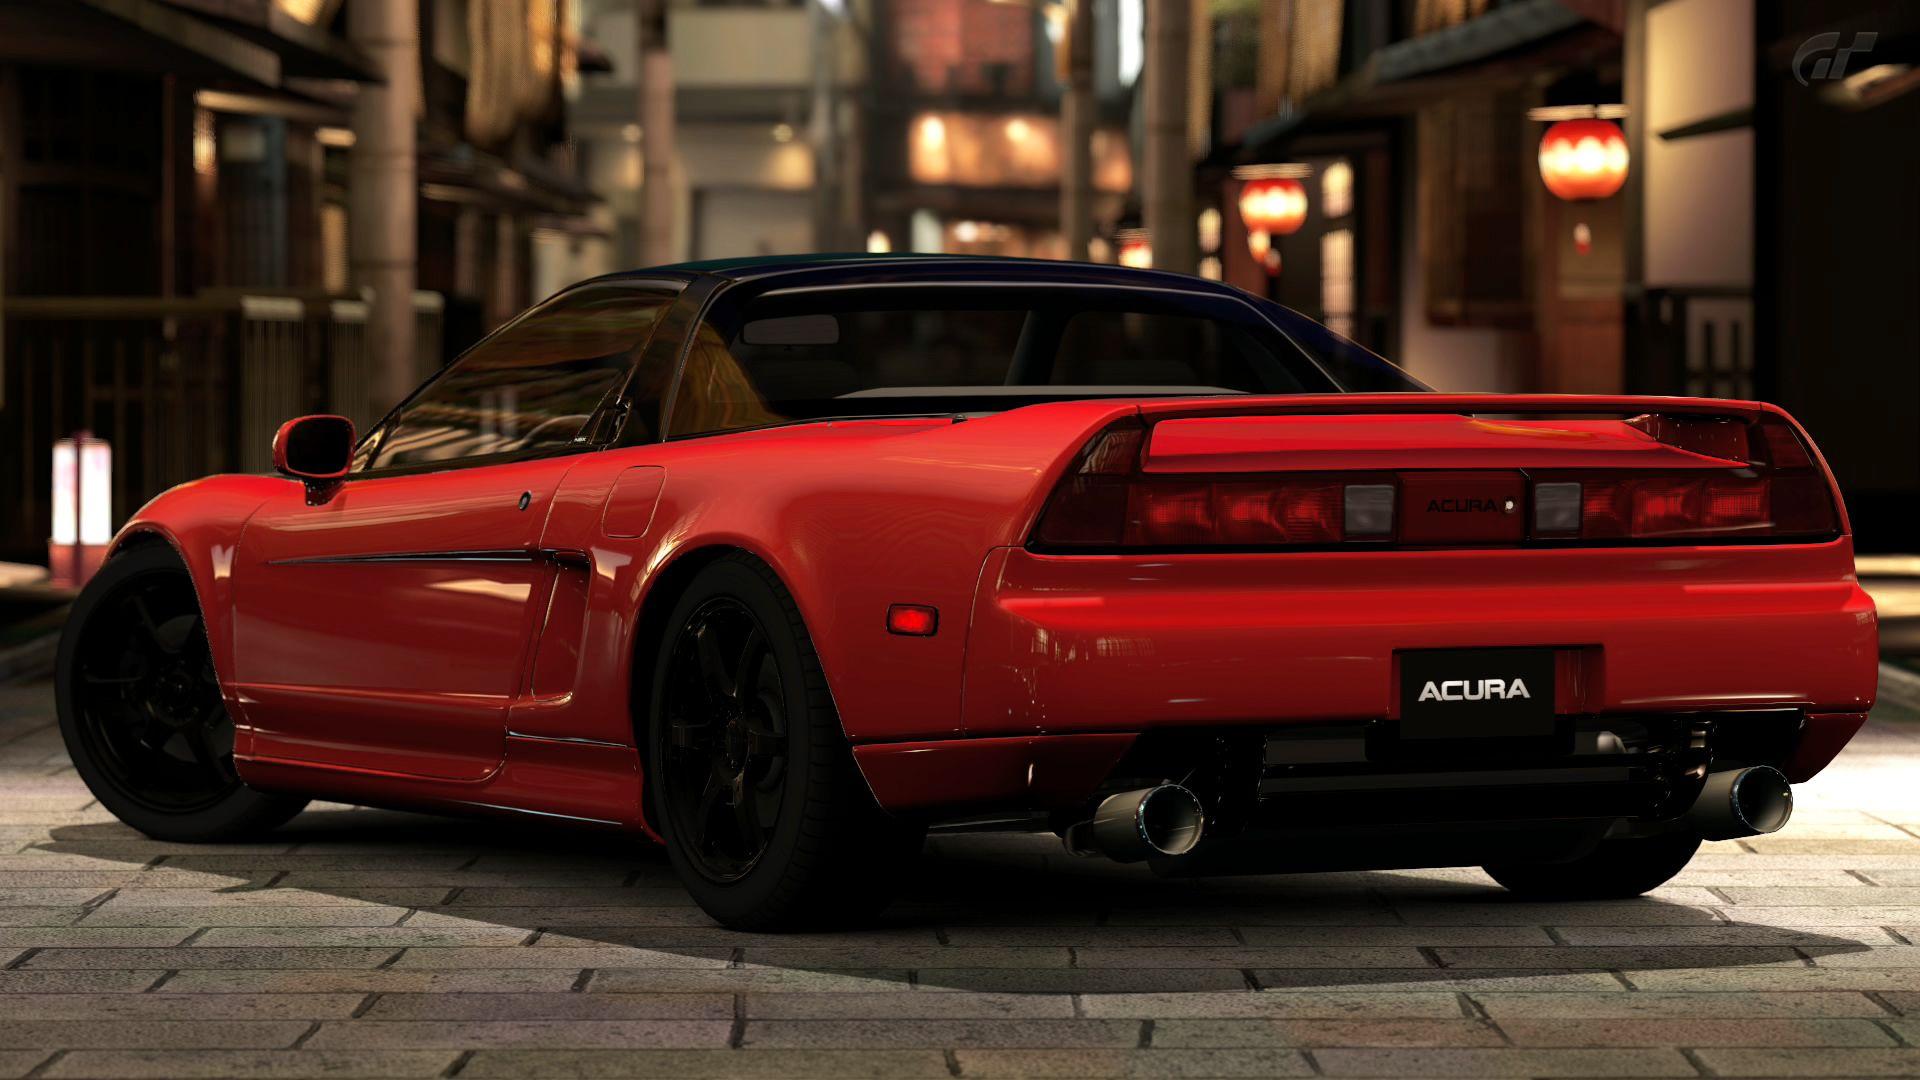 1991 Acura NSX (Gran Turismo 5) By Vertualissimo